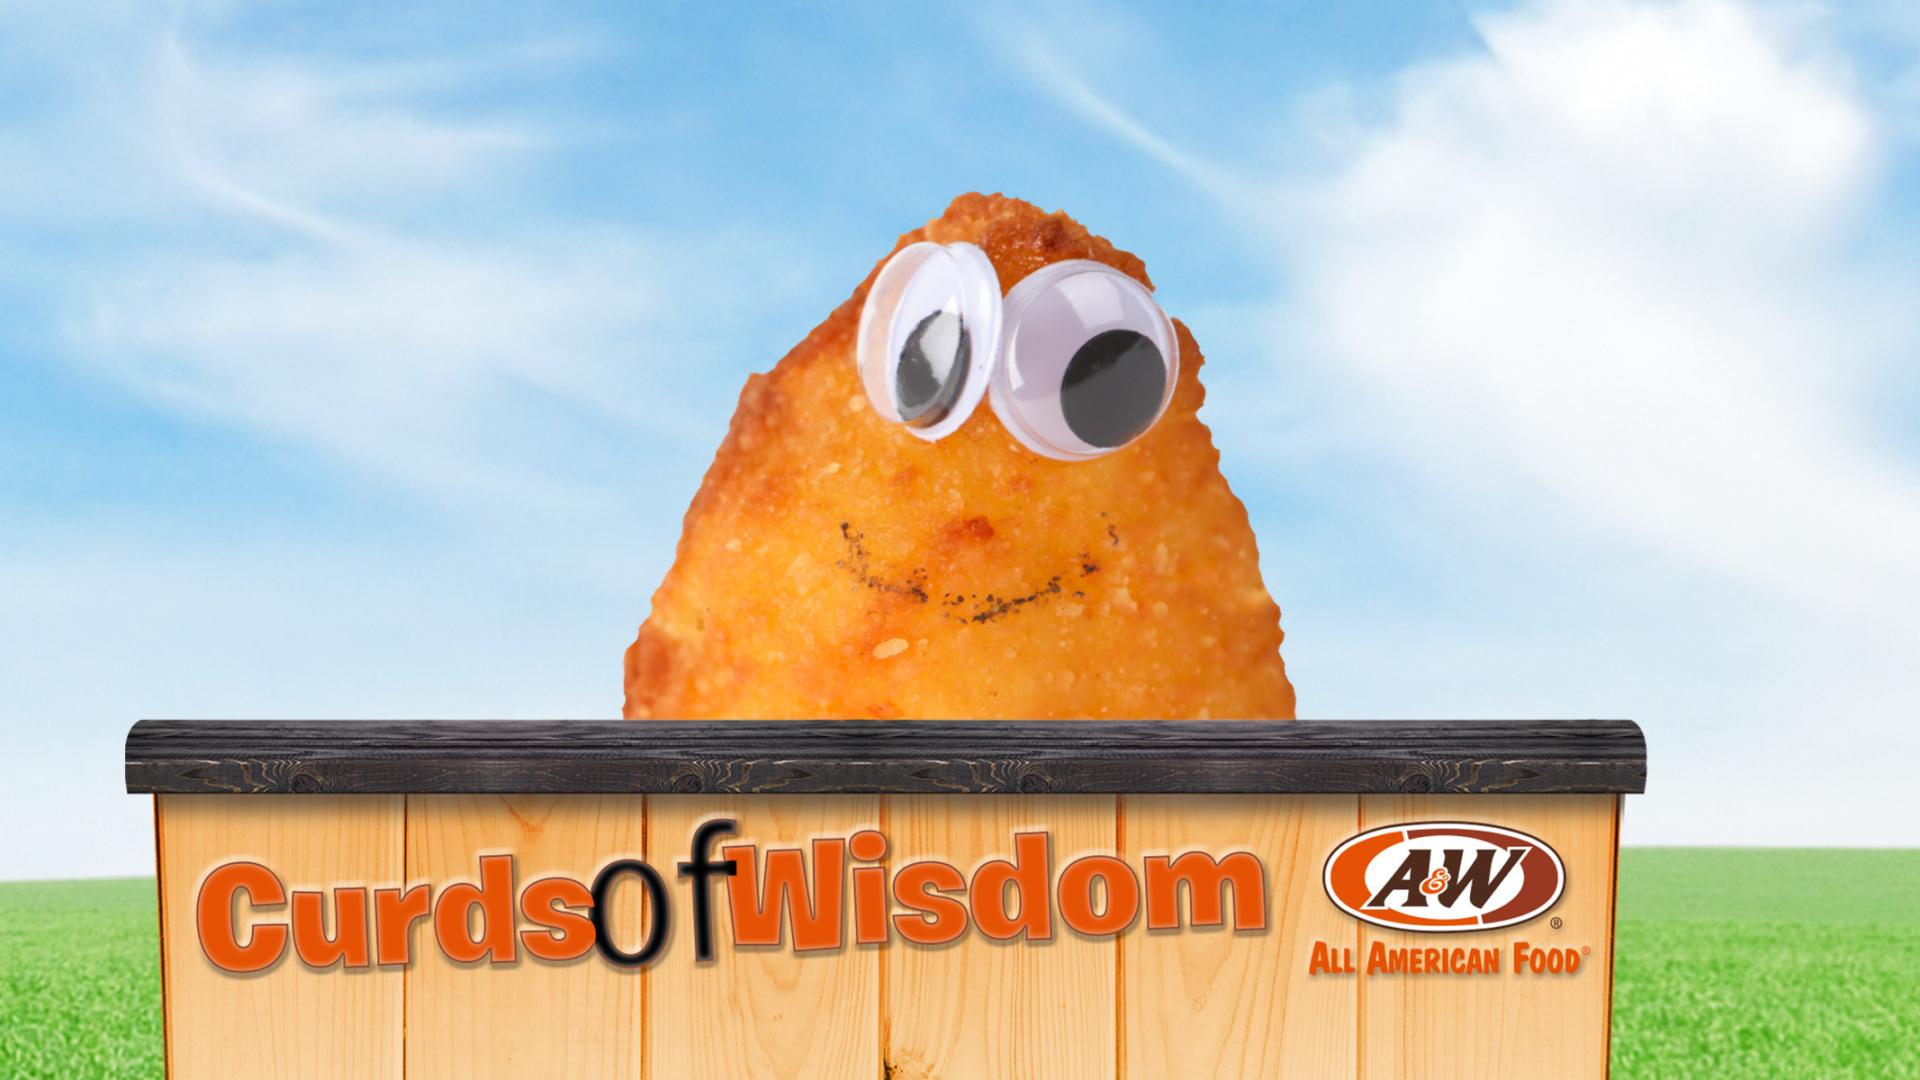 Cheese Curd of Wisdom